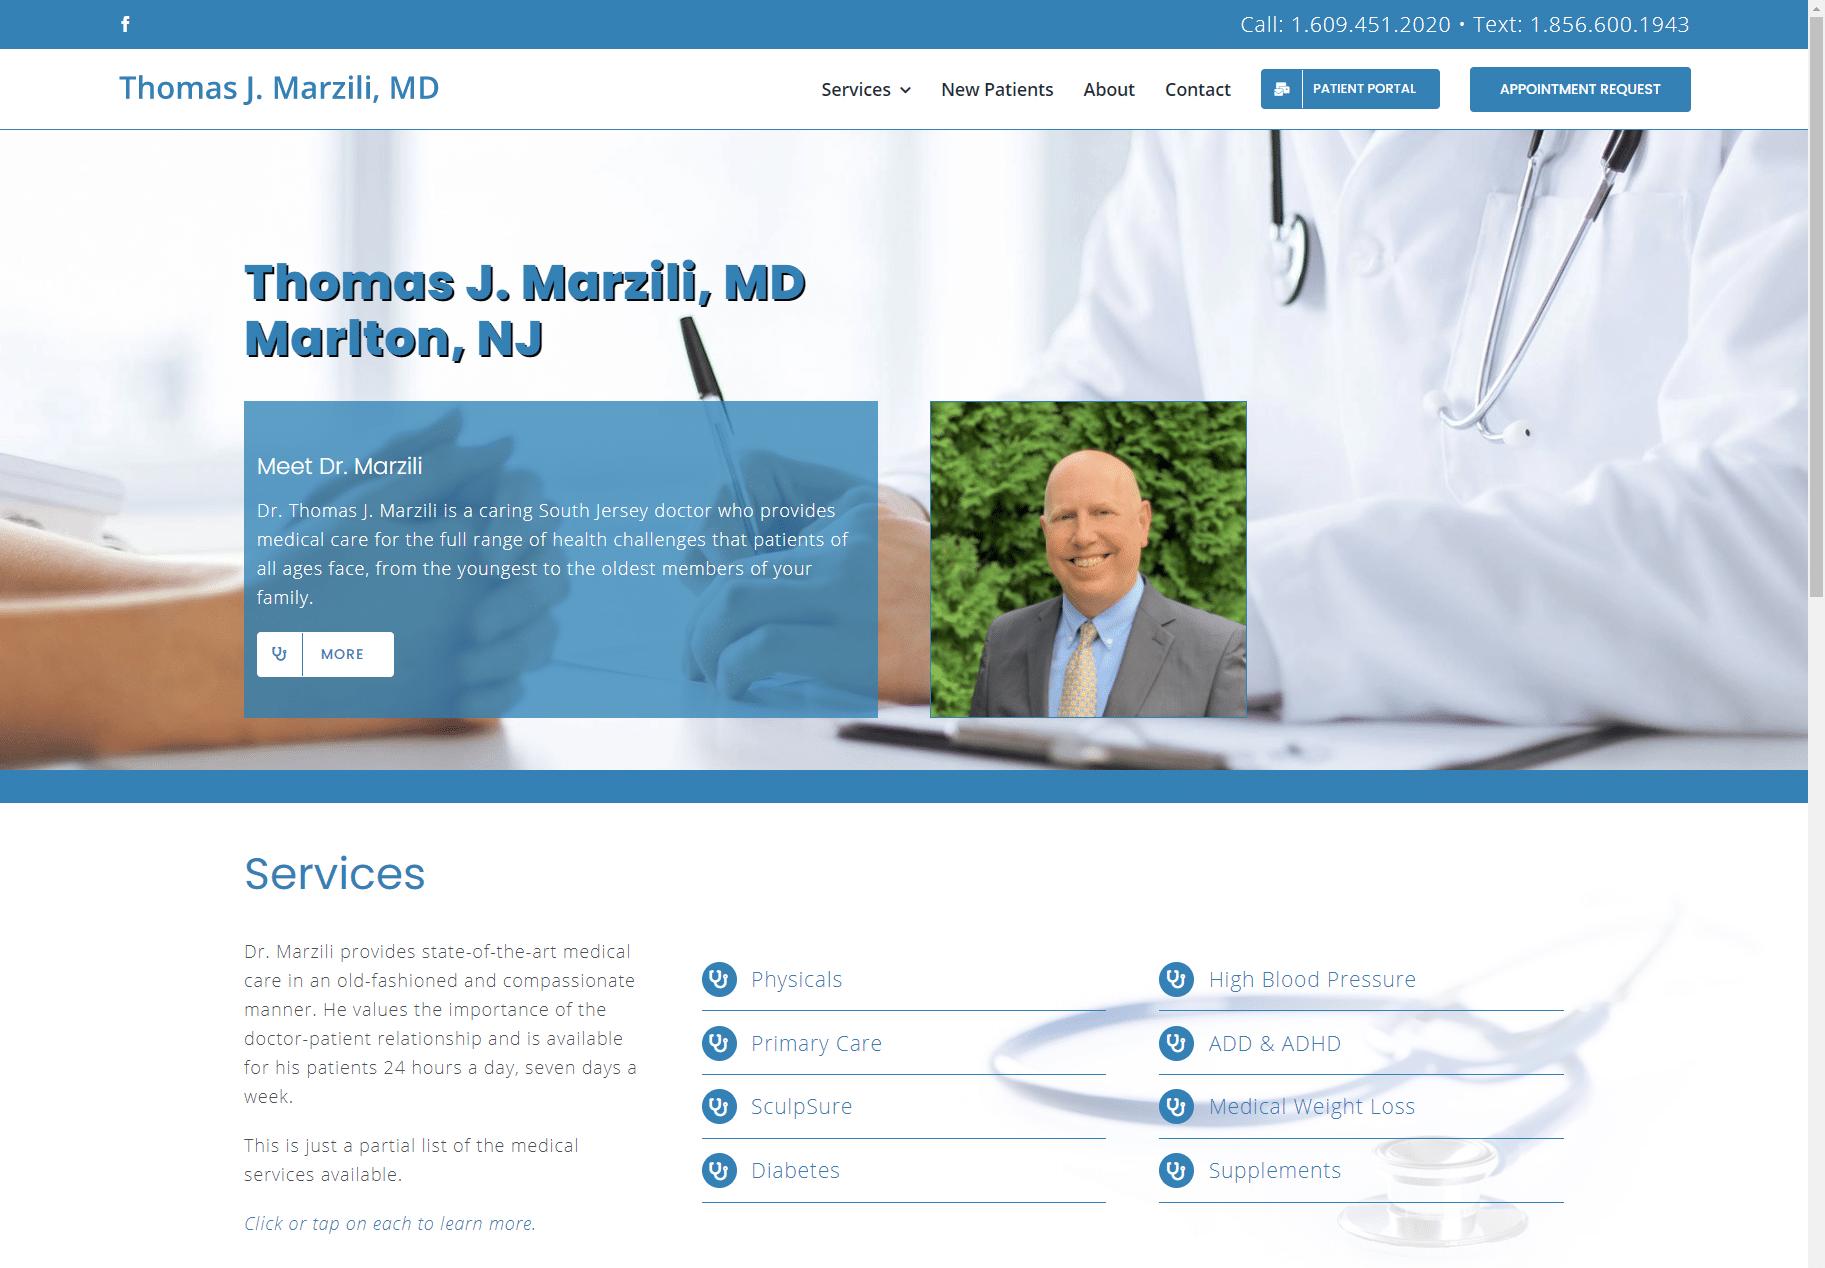 Thomas Marzili, MD